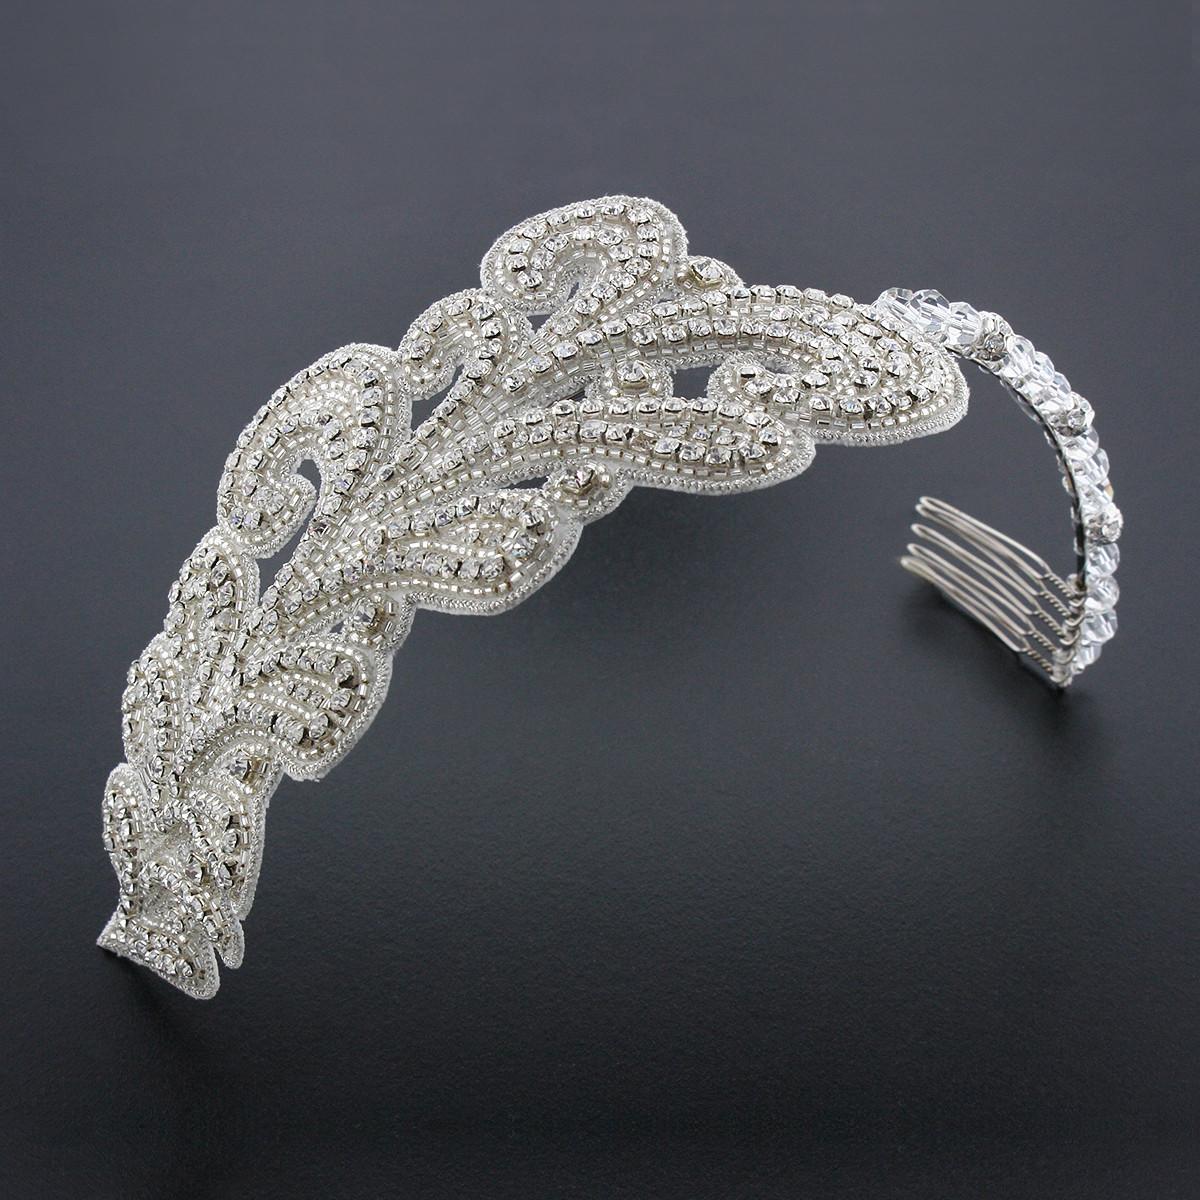 Giavan Jewelry